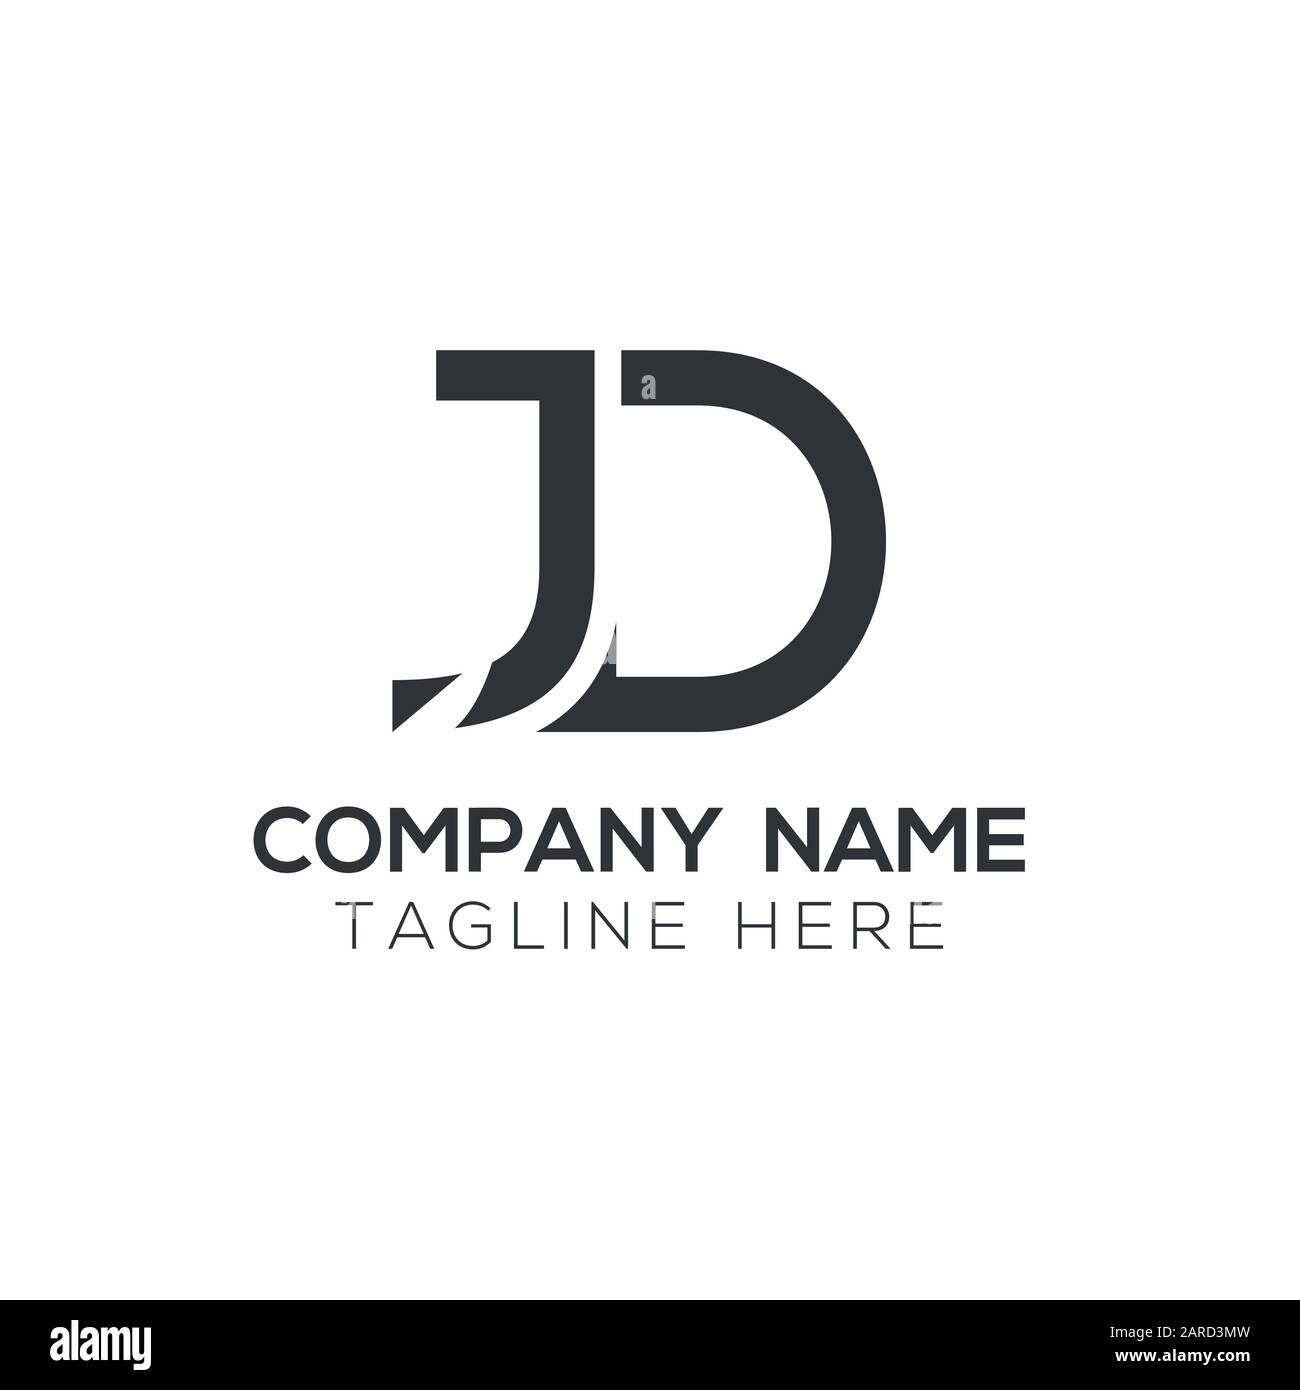 letter jd logo design vector template initial linked letter design jd vector illustration stock vector image art alamy https www alamy com letter jd logo design vector template initial linked letter design jd vector illustration image341422393 html